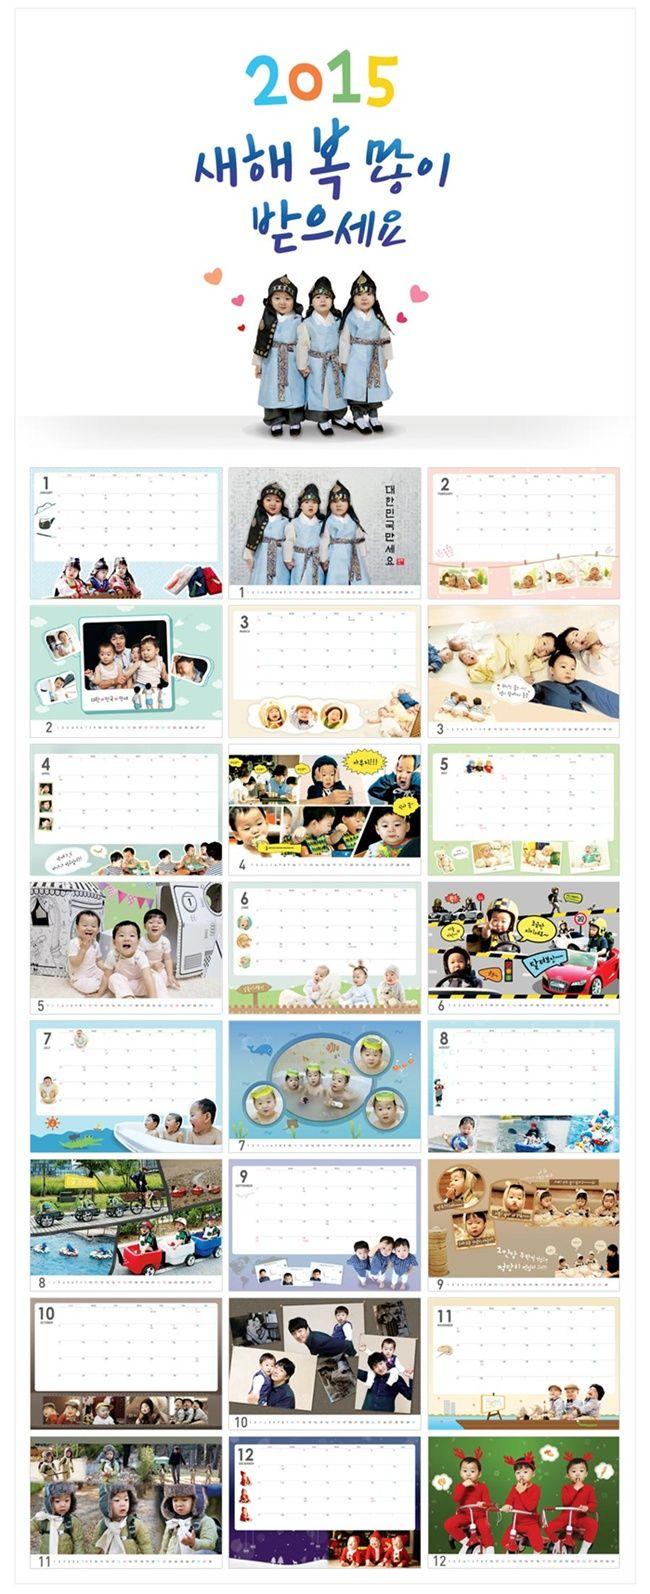 KBS The Return of Superman - Dahan Minguk Manse 2015 Calendar